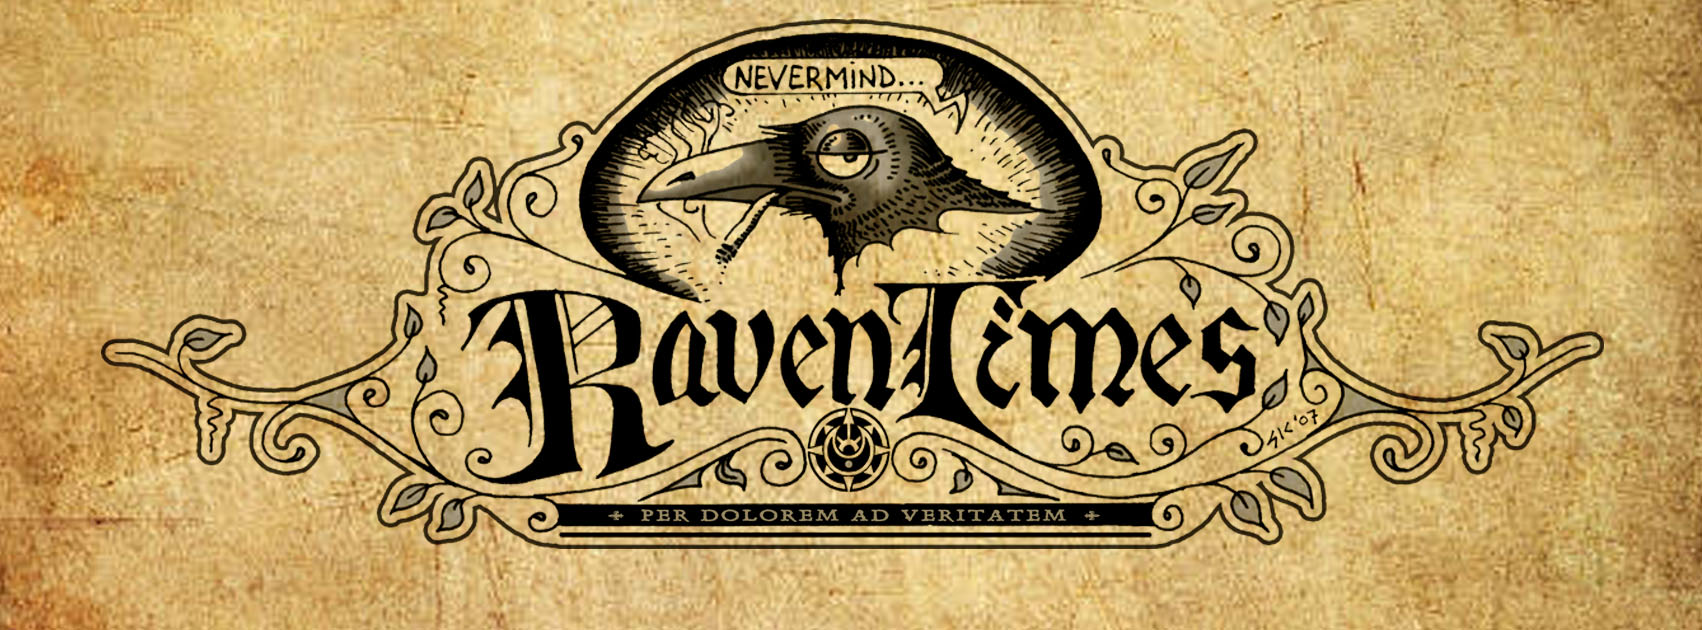 raventimes-logo.jpg